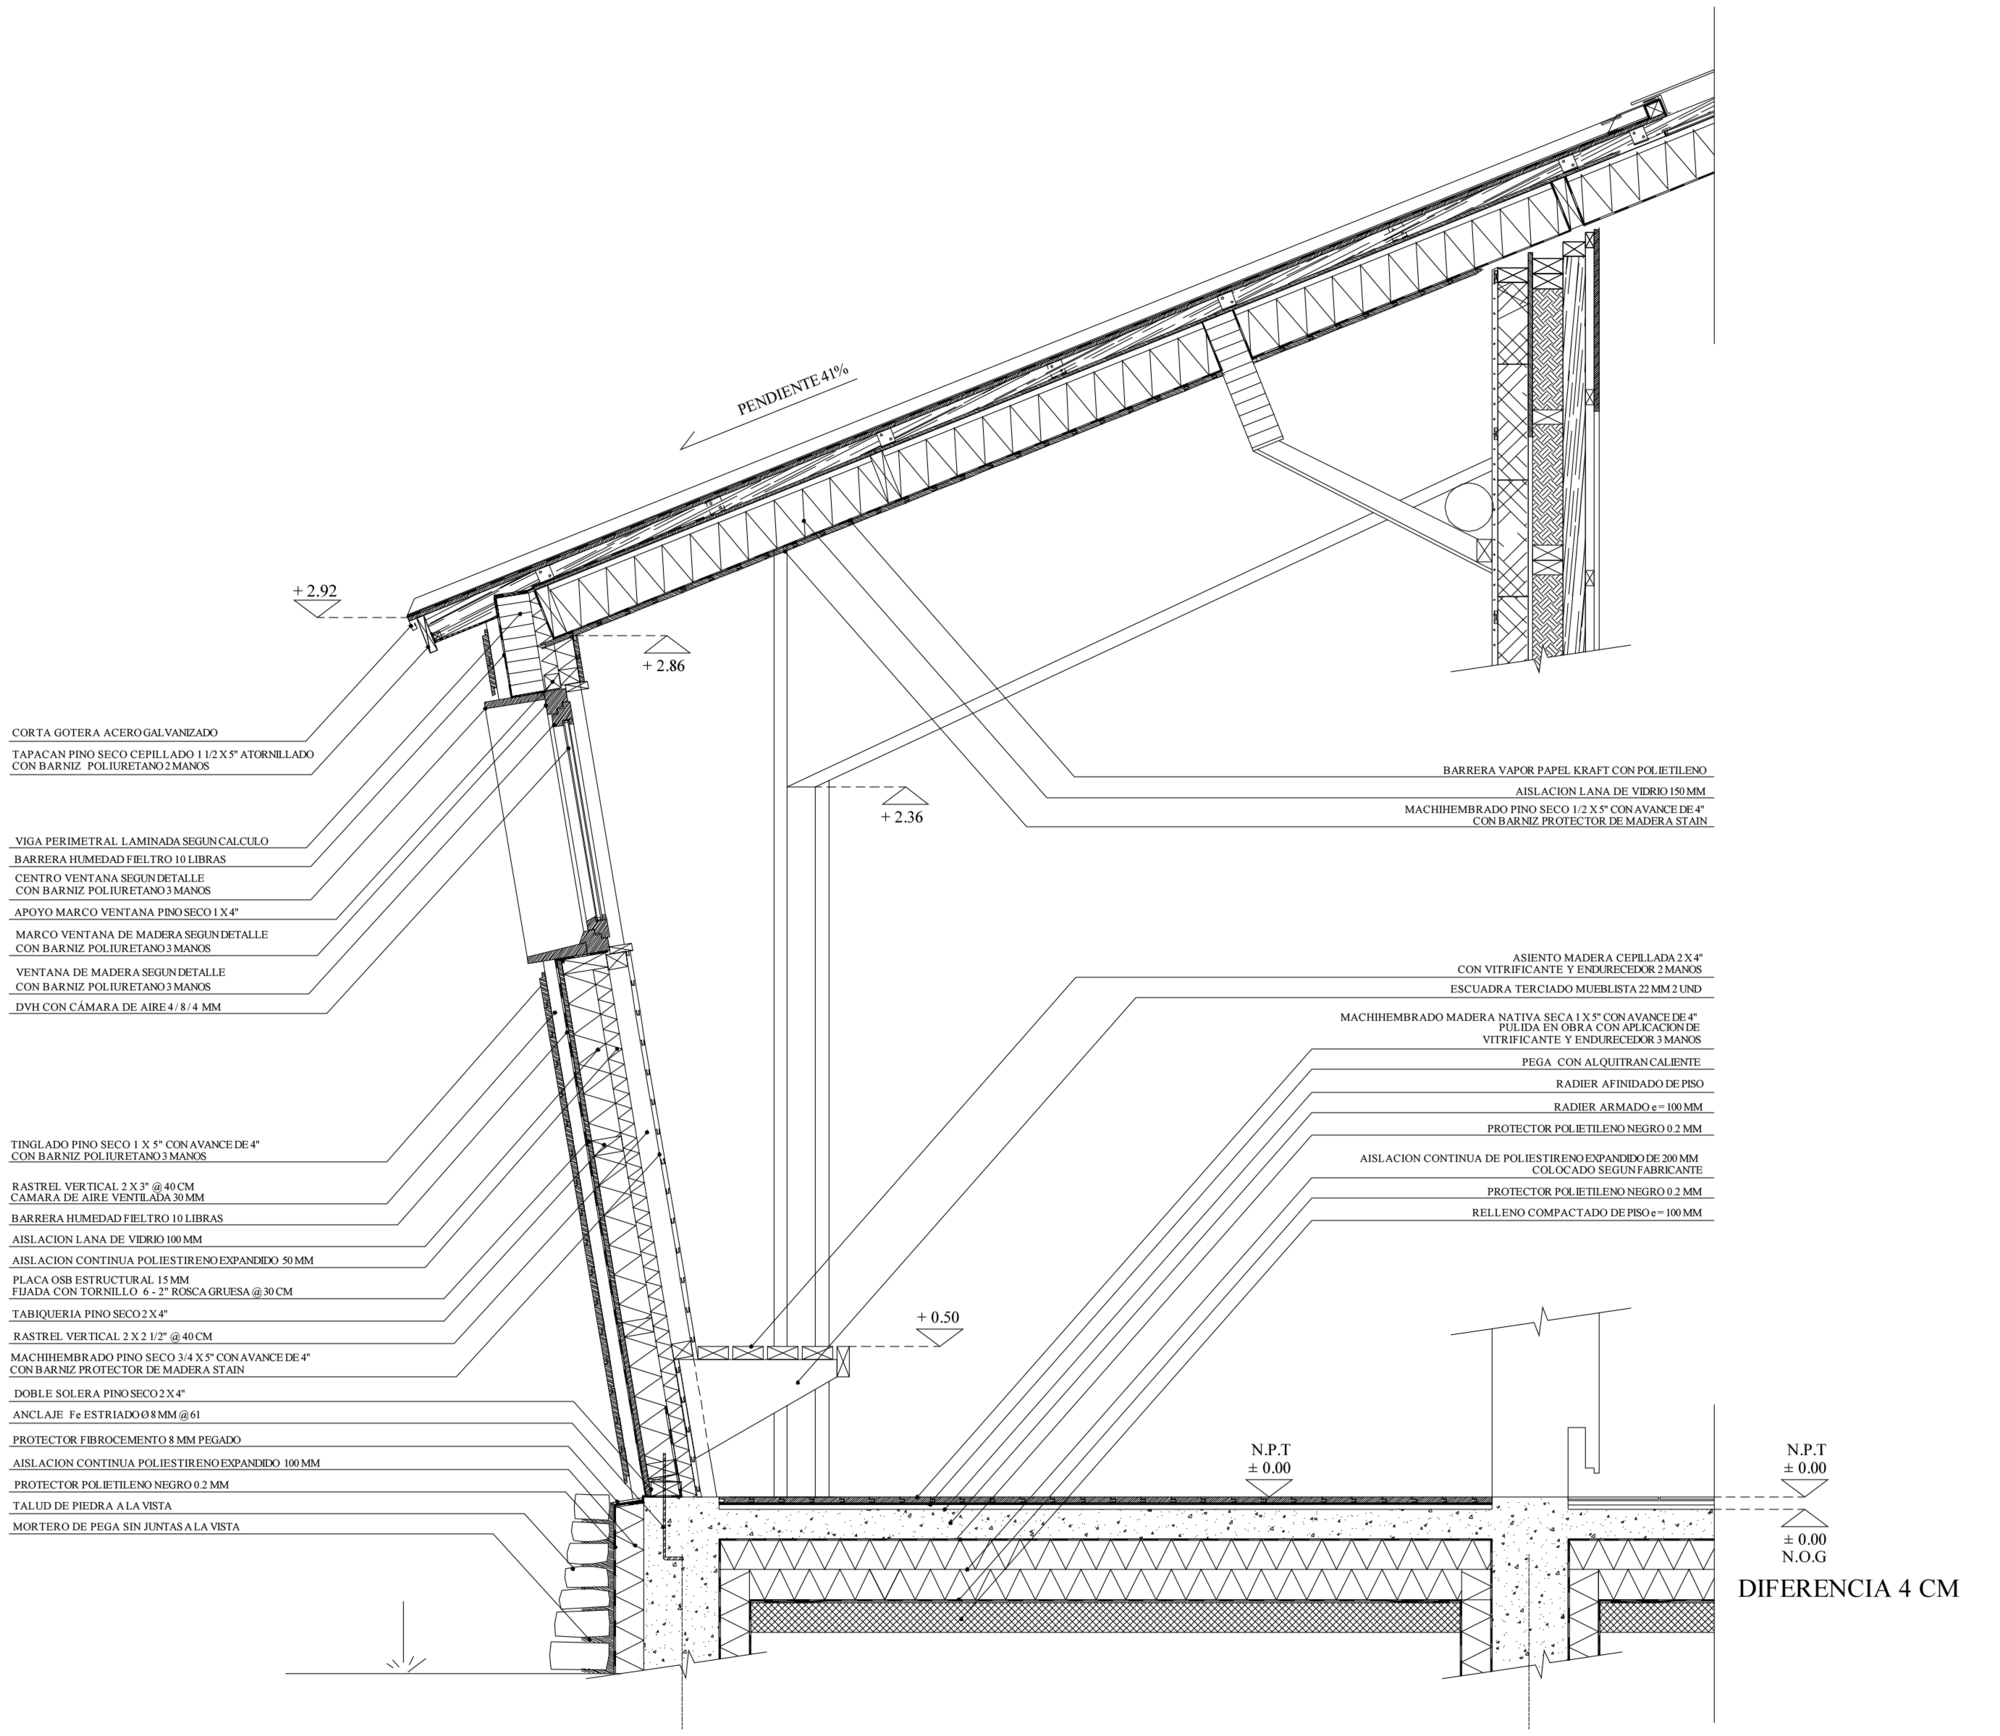 Galer a de en detalle madera paja y adobe centro hol stico punto zero 41 - Detalle constructivo techo ...